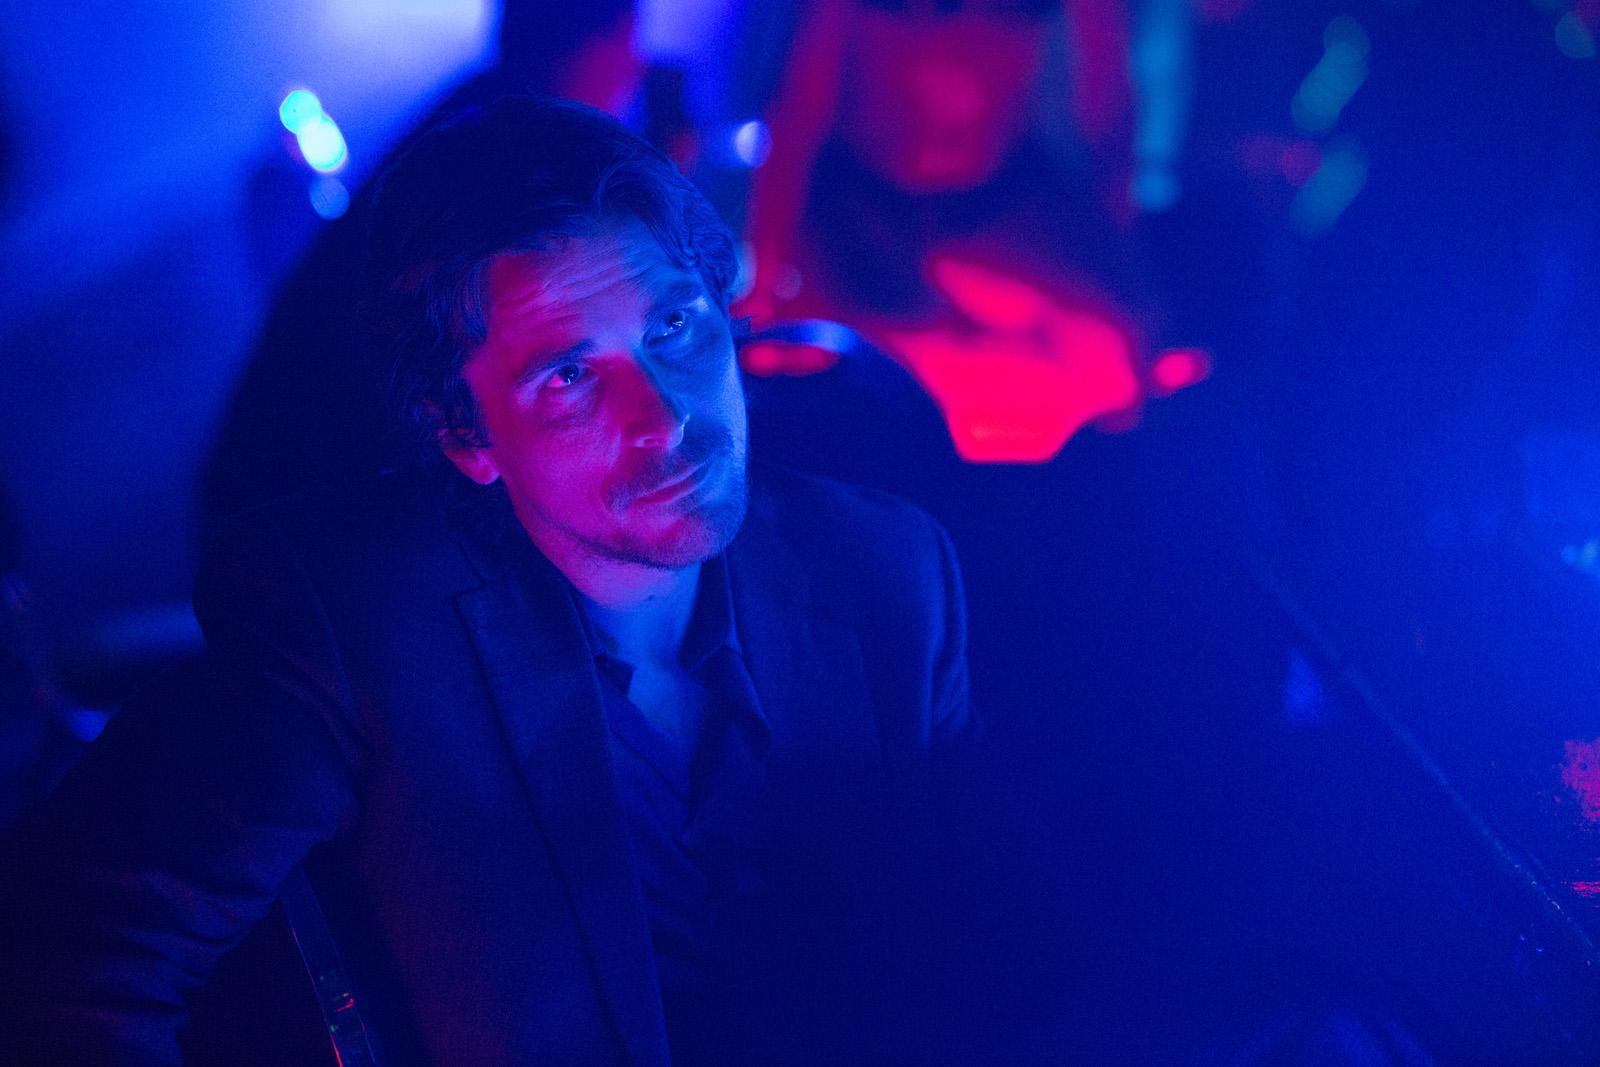 Rick (Christian Bale)